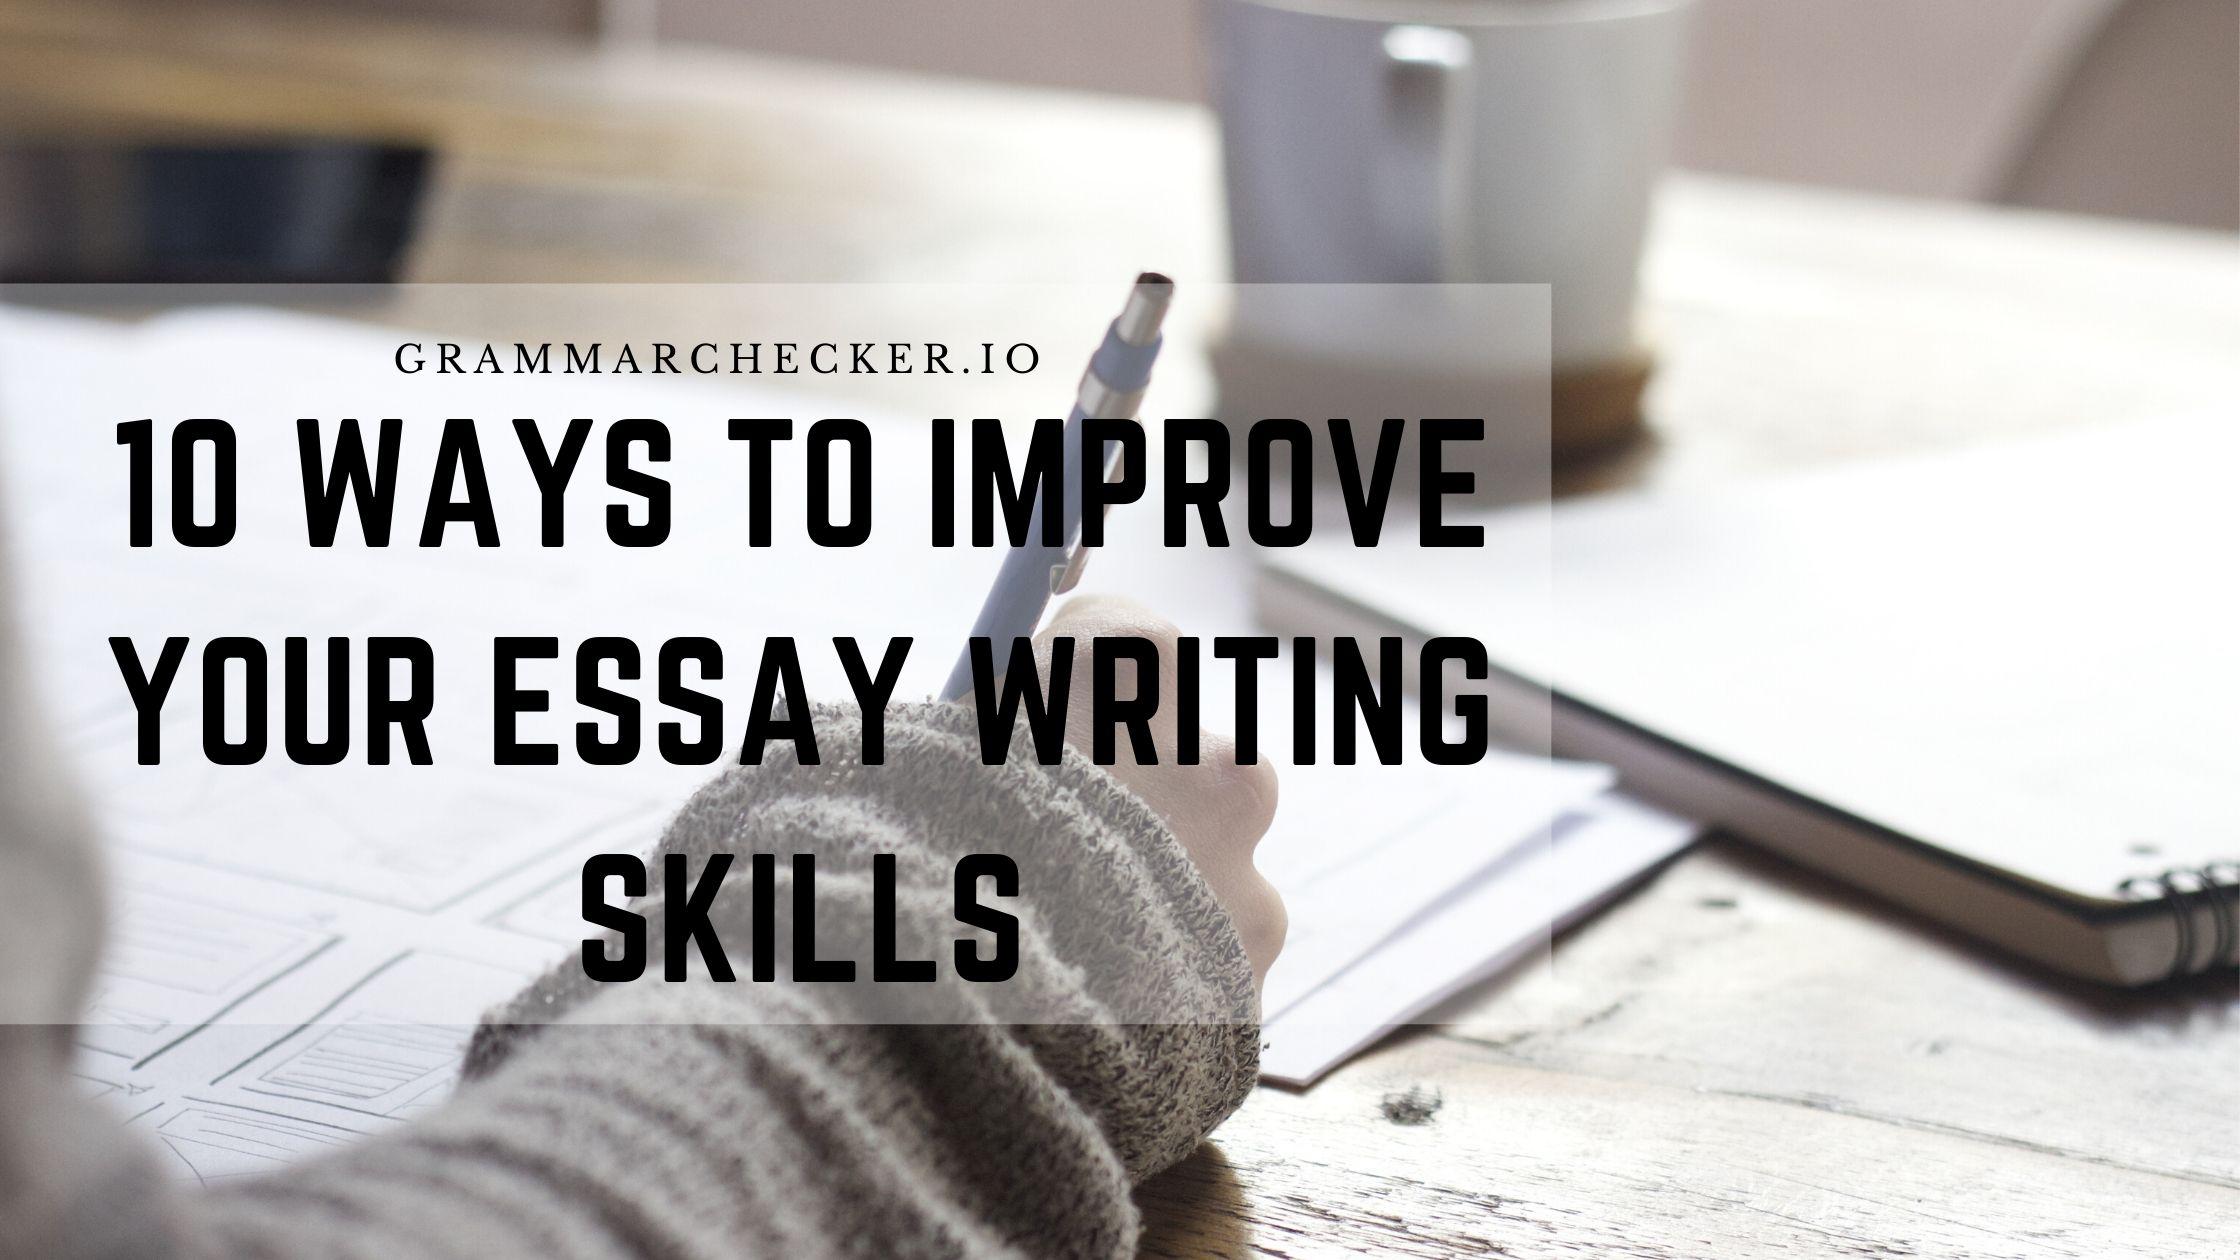 10 Ways to Improve Your Essay Writing Skills